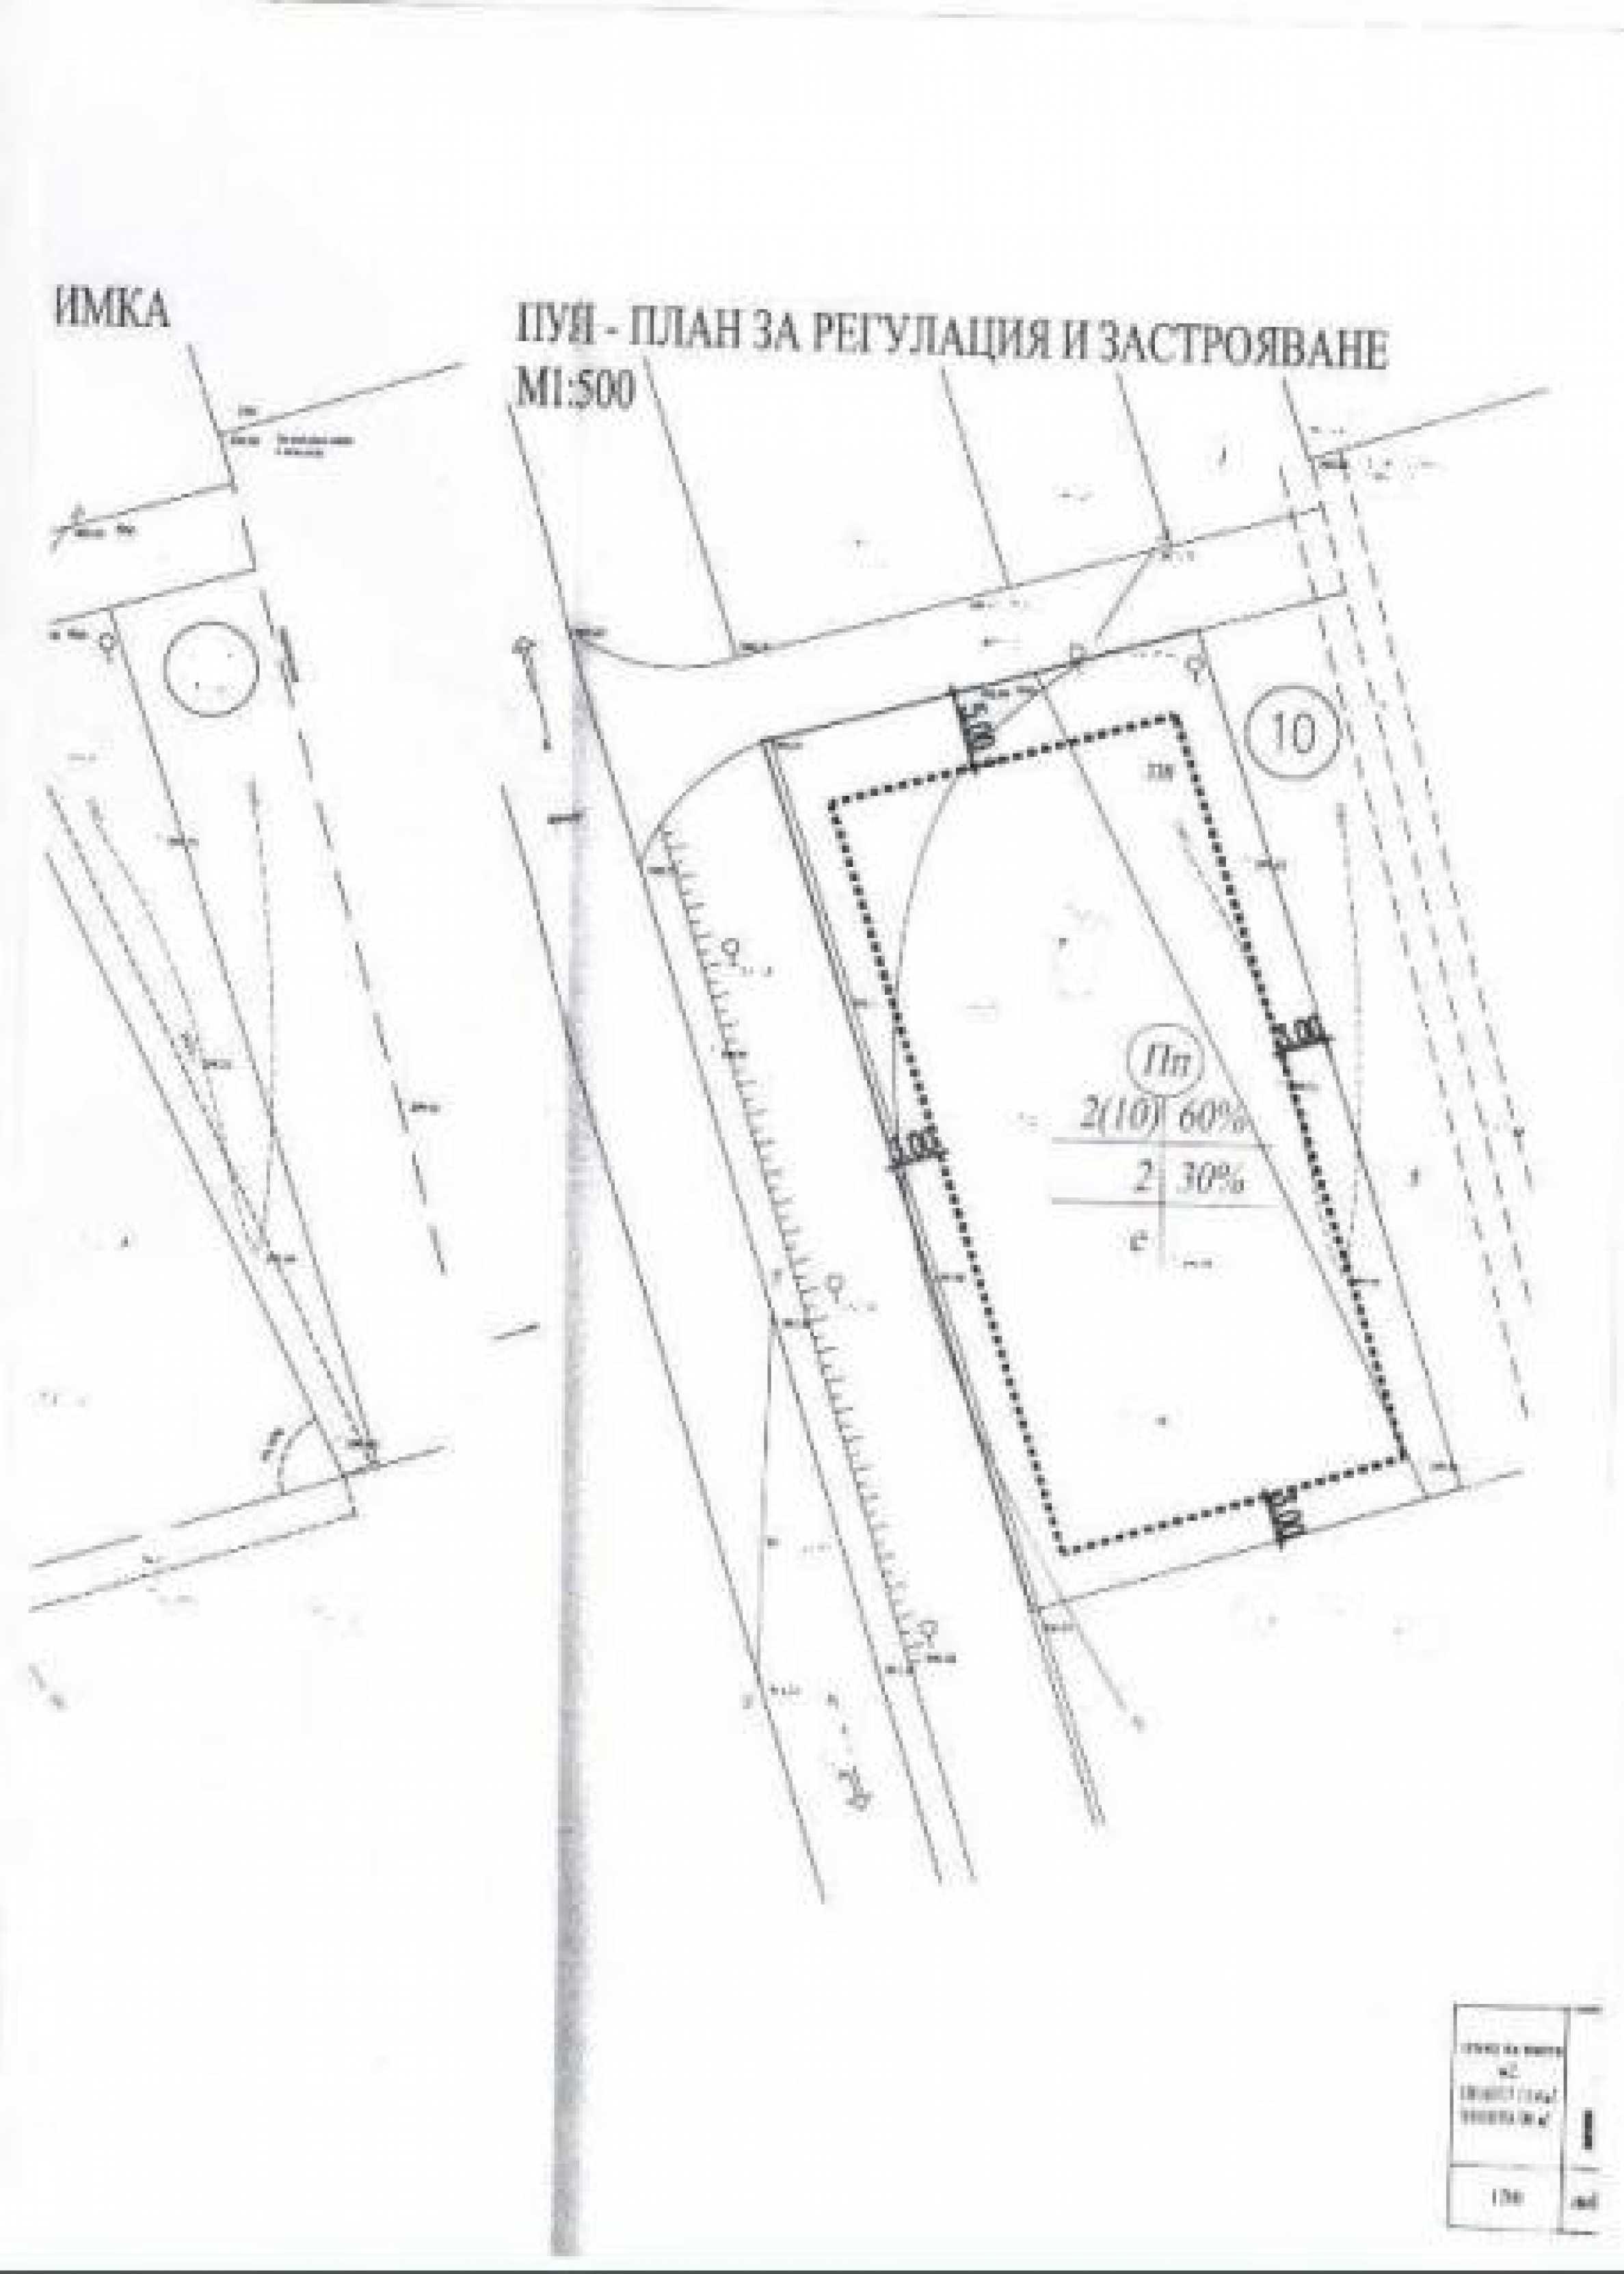 A regulated plot for industrial purposes in Kichevo 5